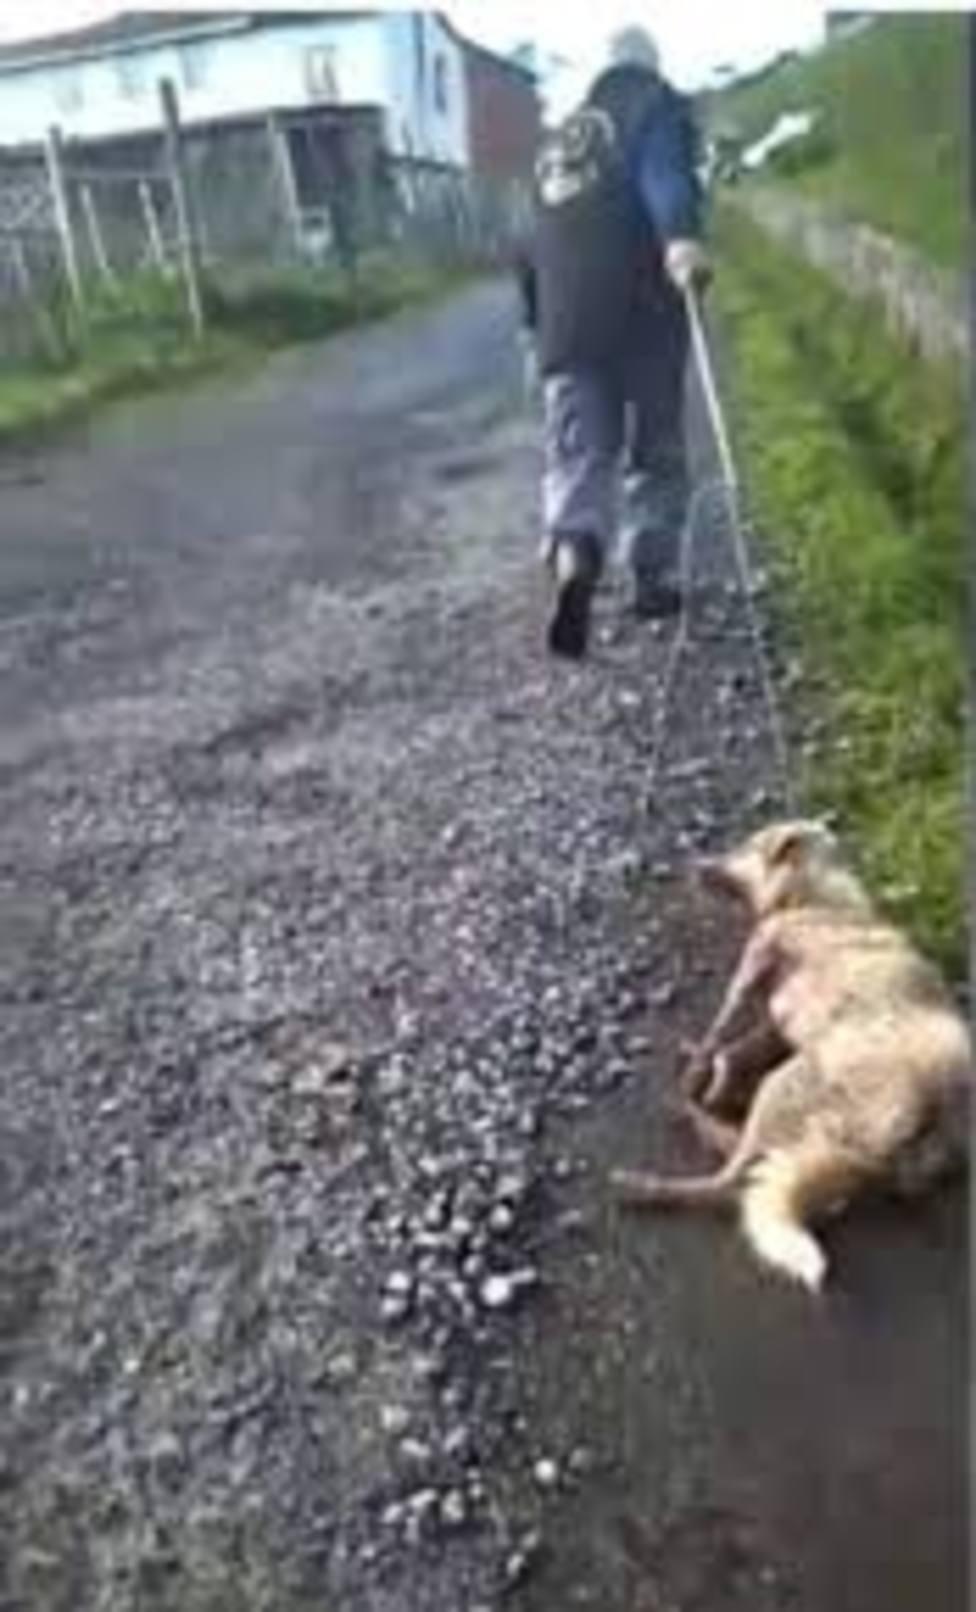 El hombre que disparó a su perra en Chantada se enfrentará a múltiples querellas